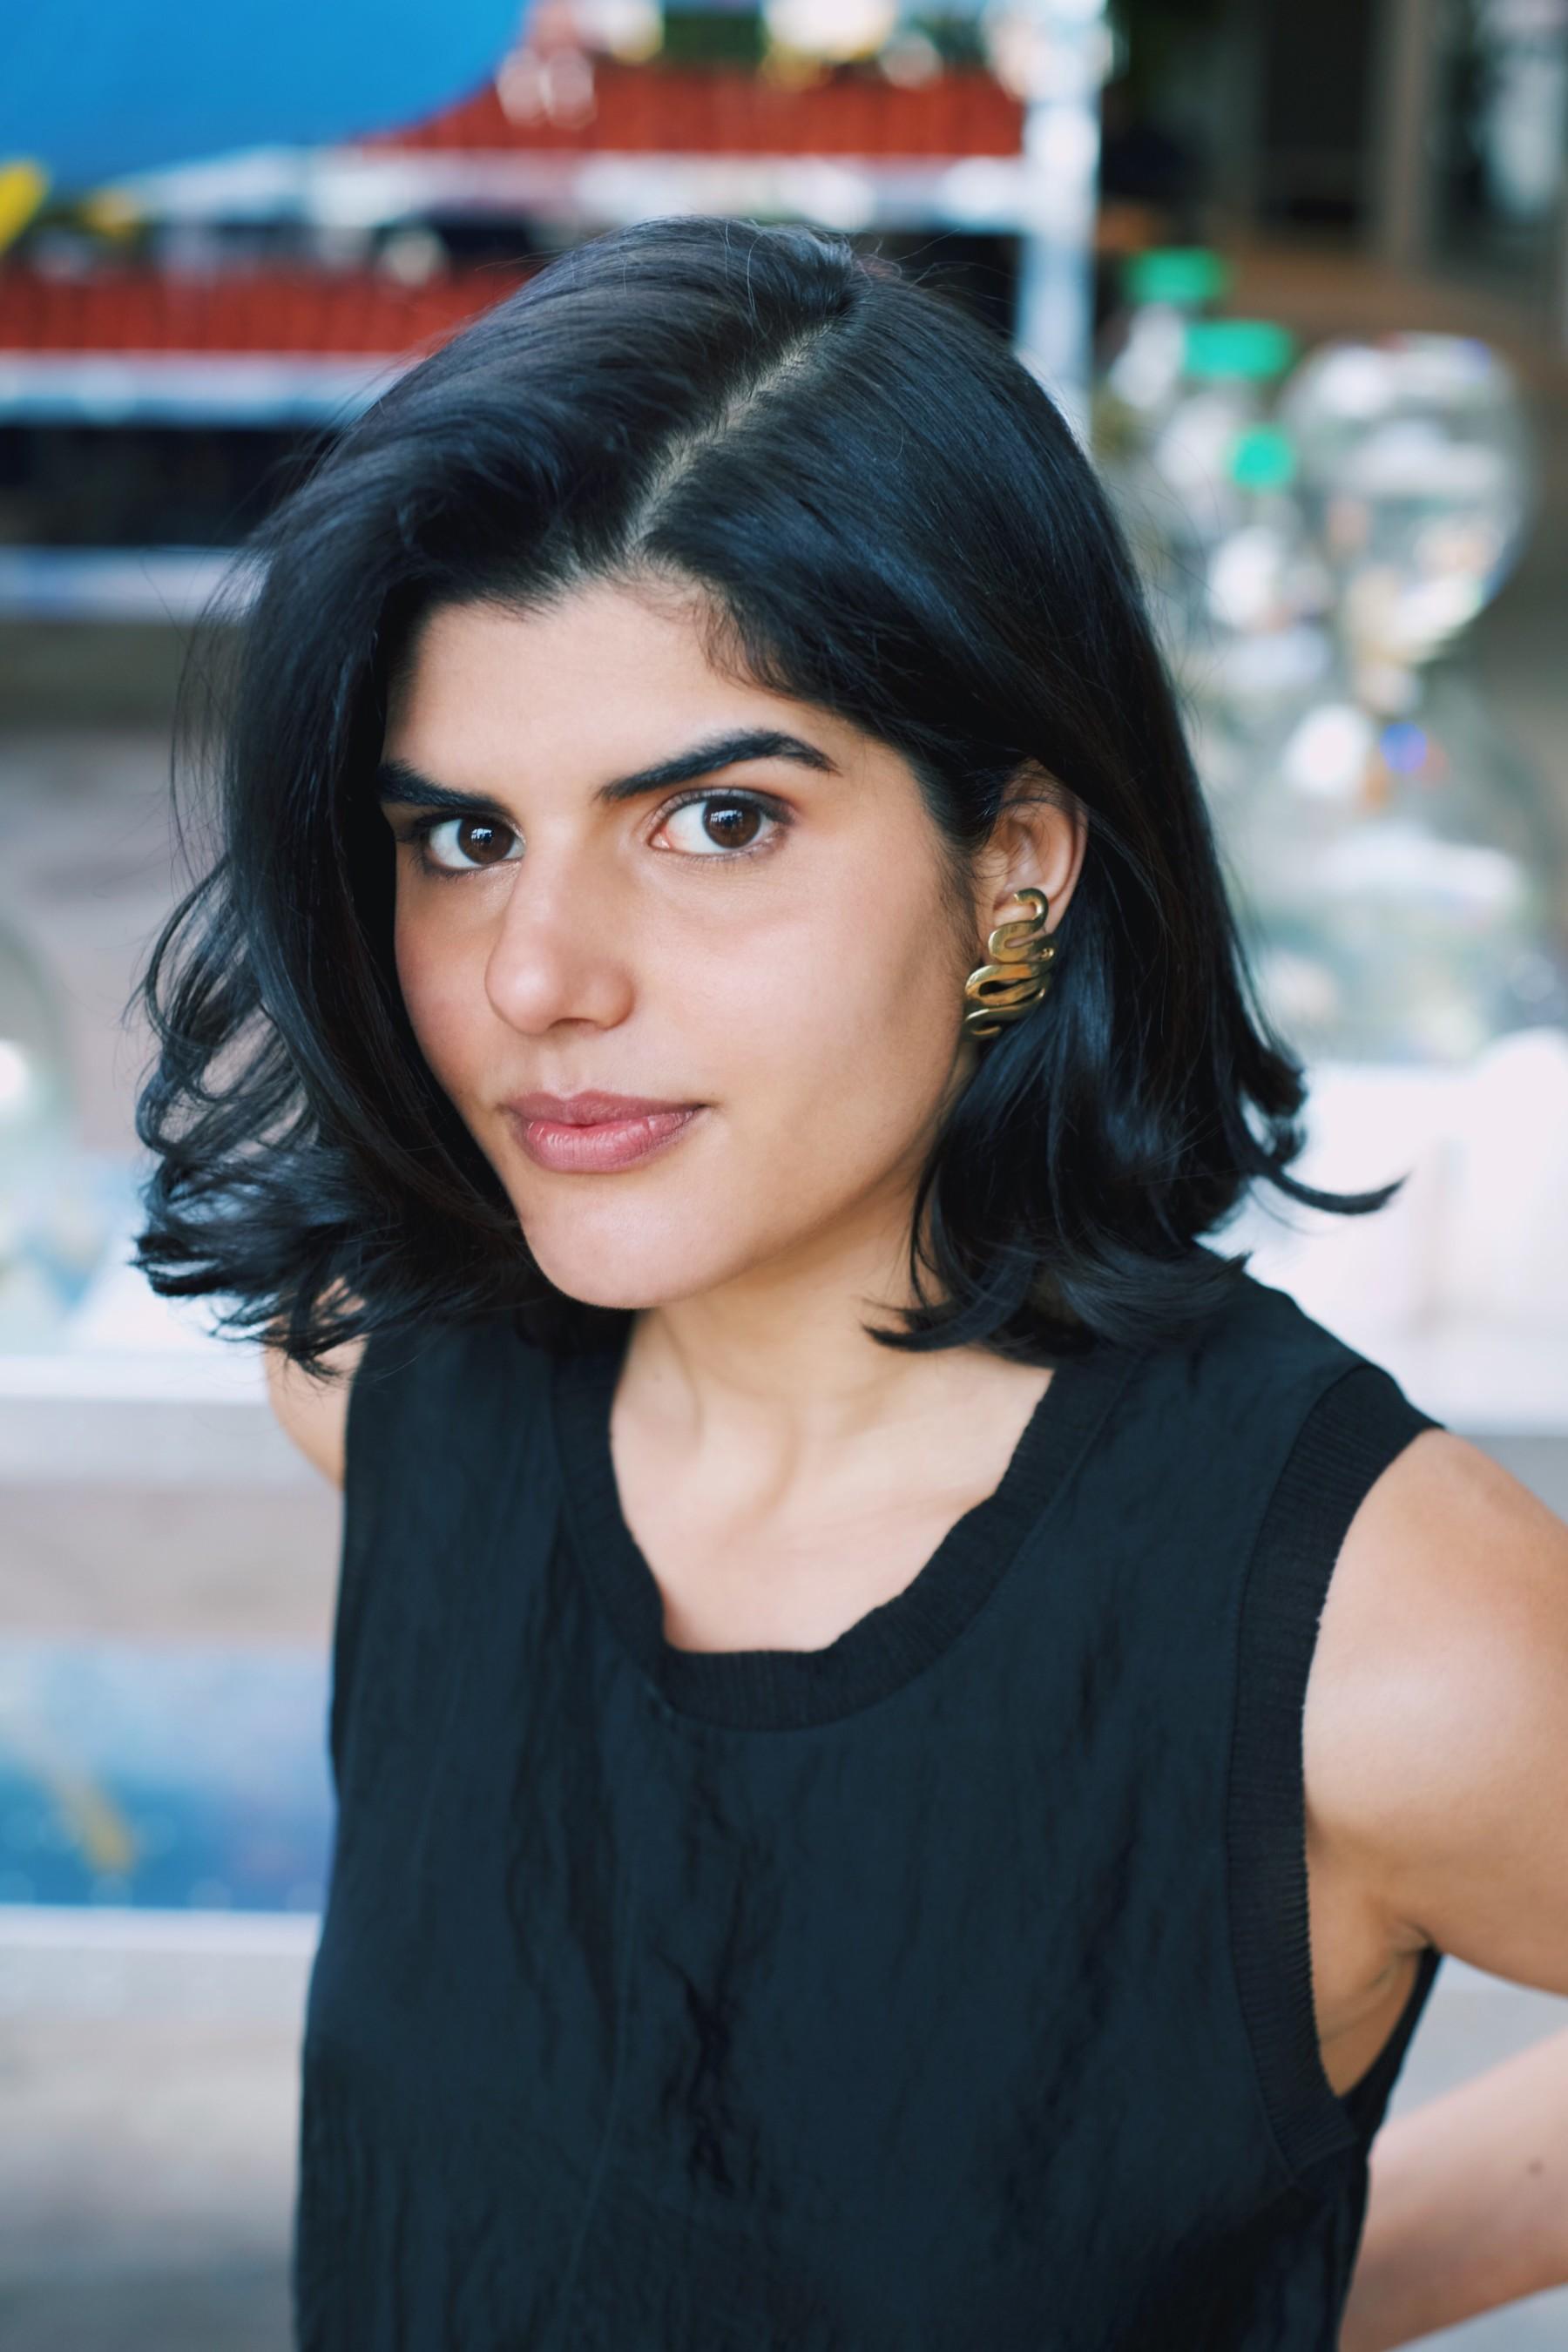 Gabriella Vigoreaux headshot